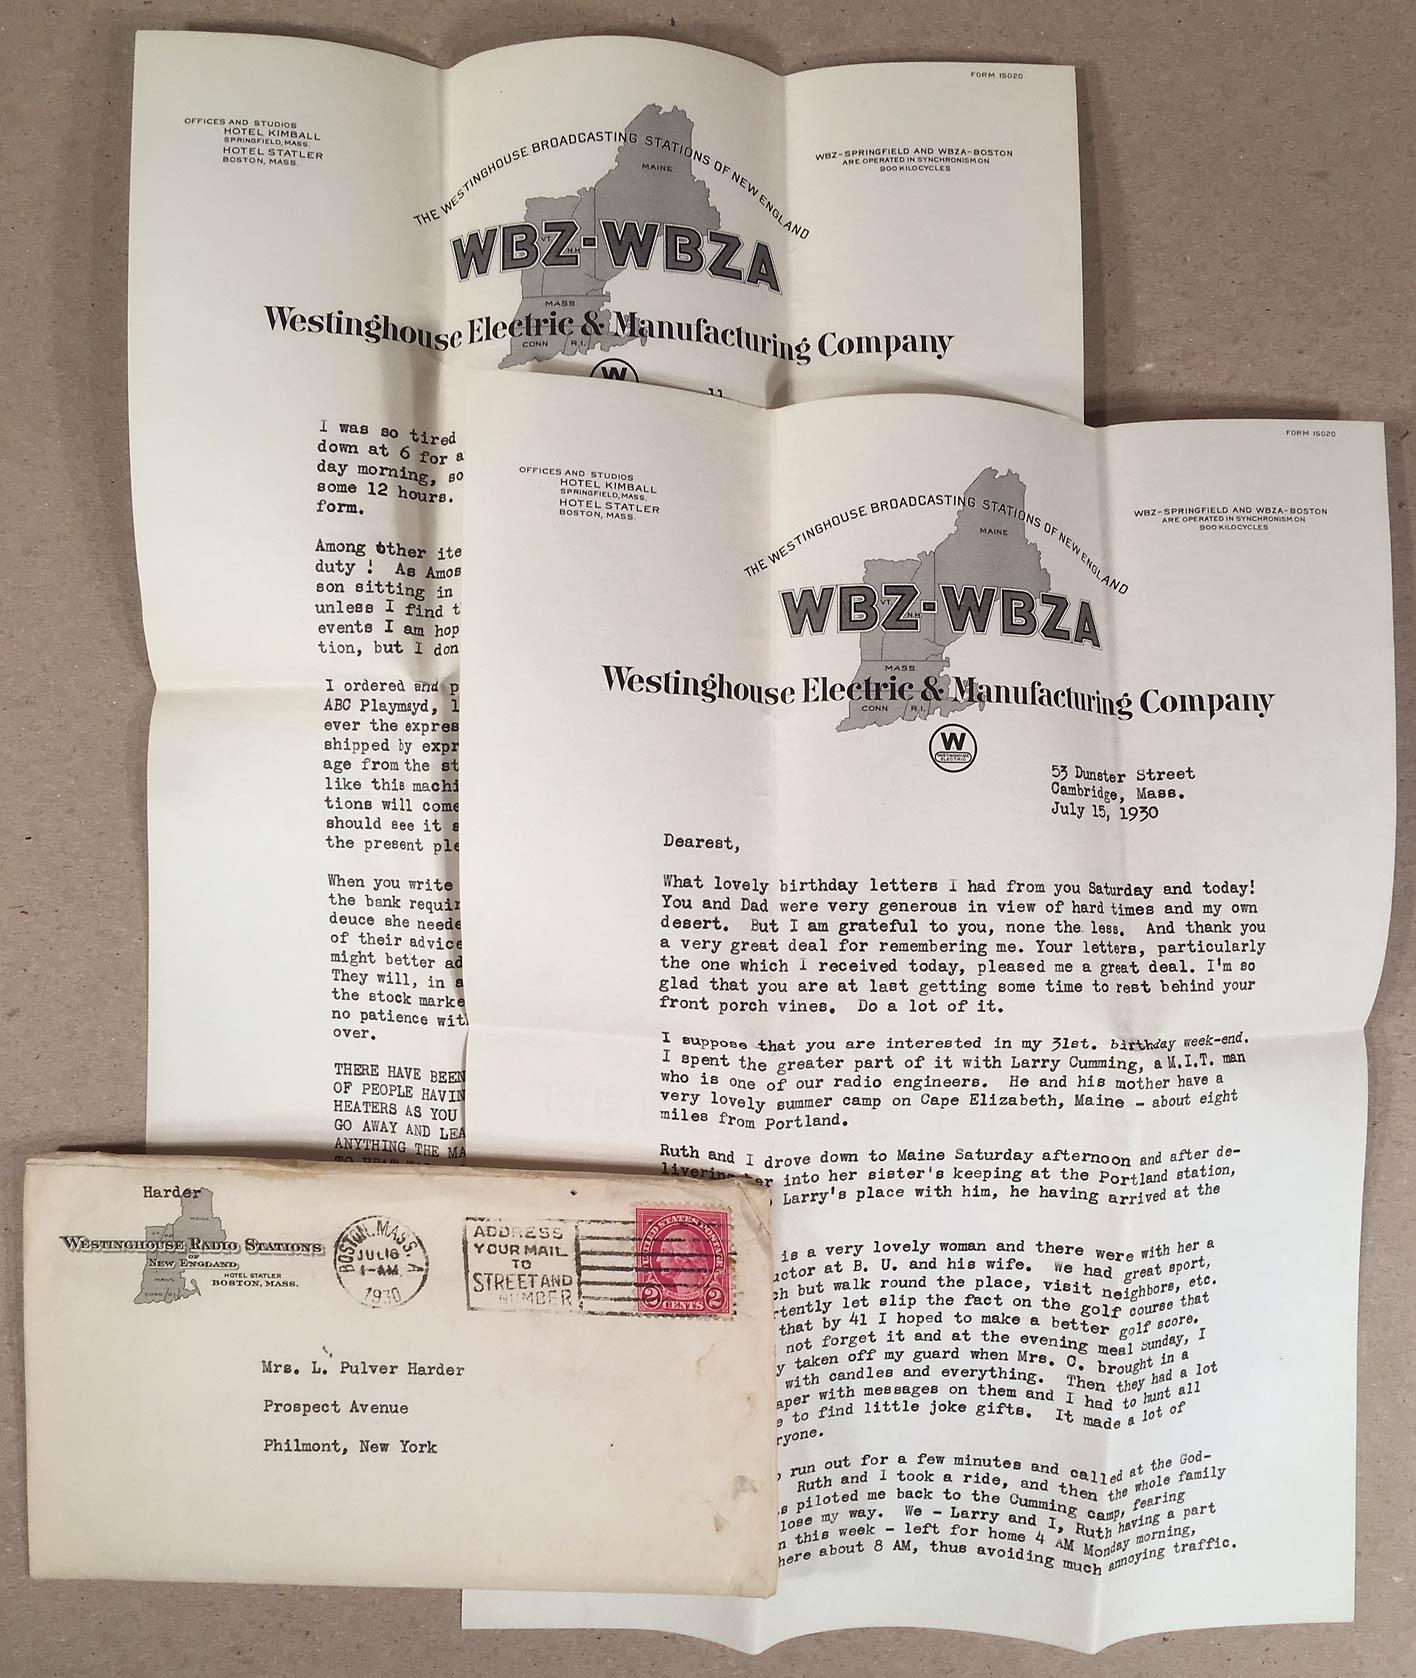 Boston Radio Stations >> Details About Boston Ma Rare 1930 Wbz Wbza Westinghouse Radio Stations Letterhead Envelope 2